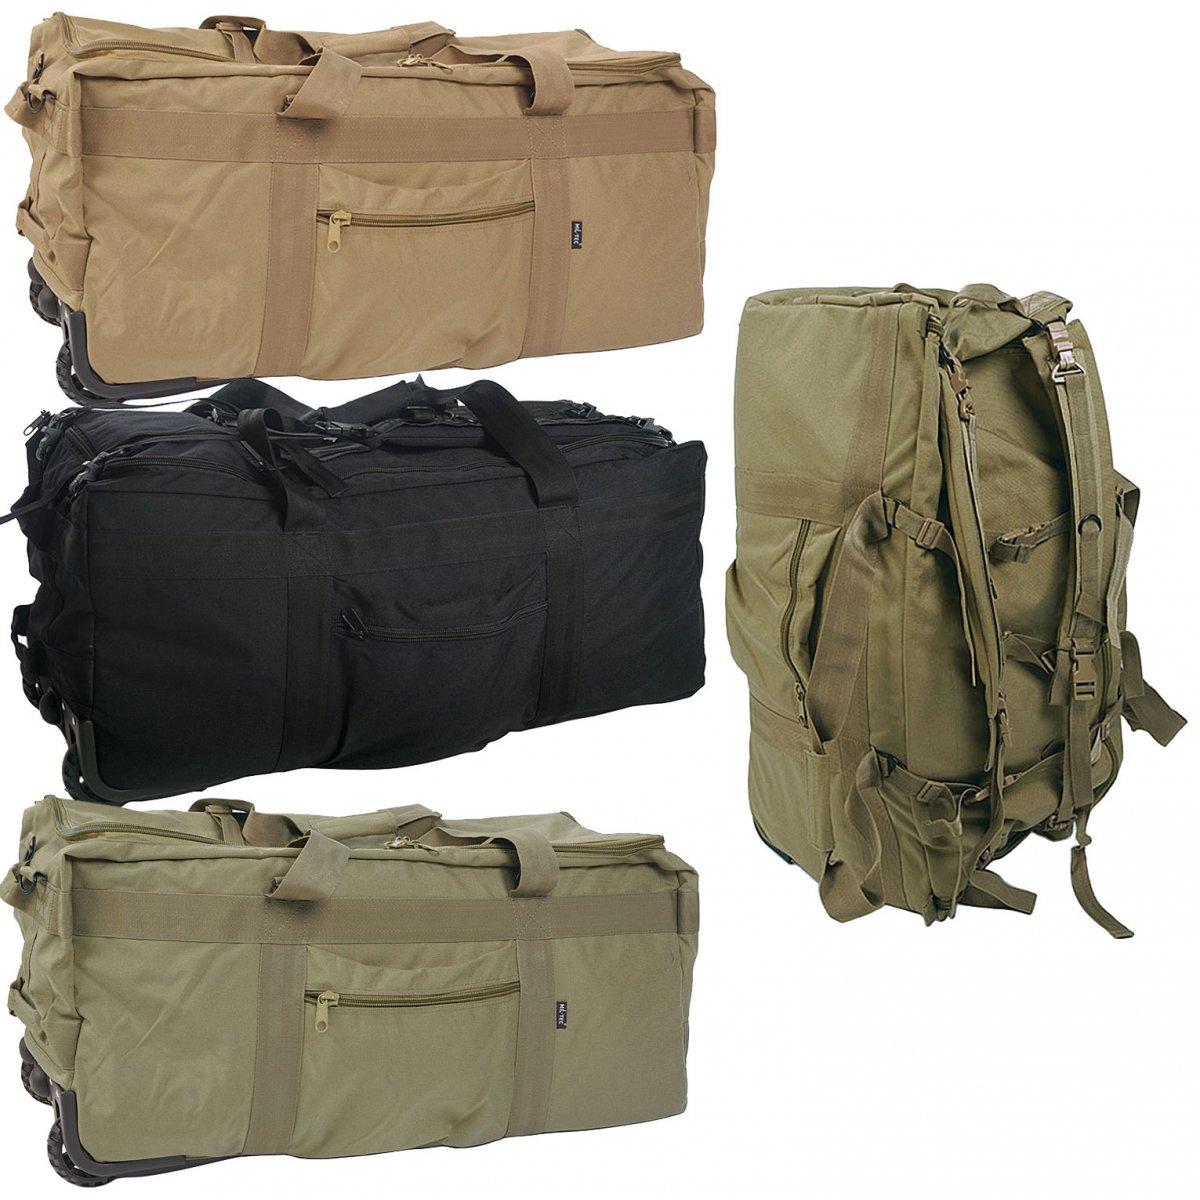 kampftrageseesack mit rollen 100 l seesack rucksack armee reisetasche tasche ebay. Black Bedroom Furniture Sets. Home Design Ideas